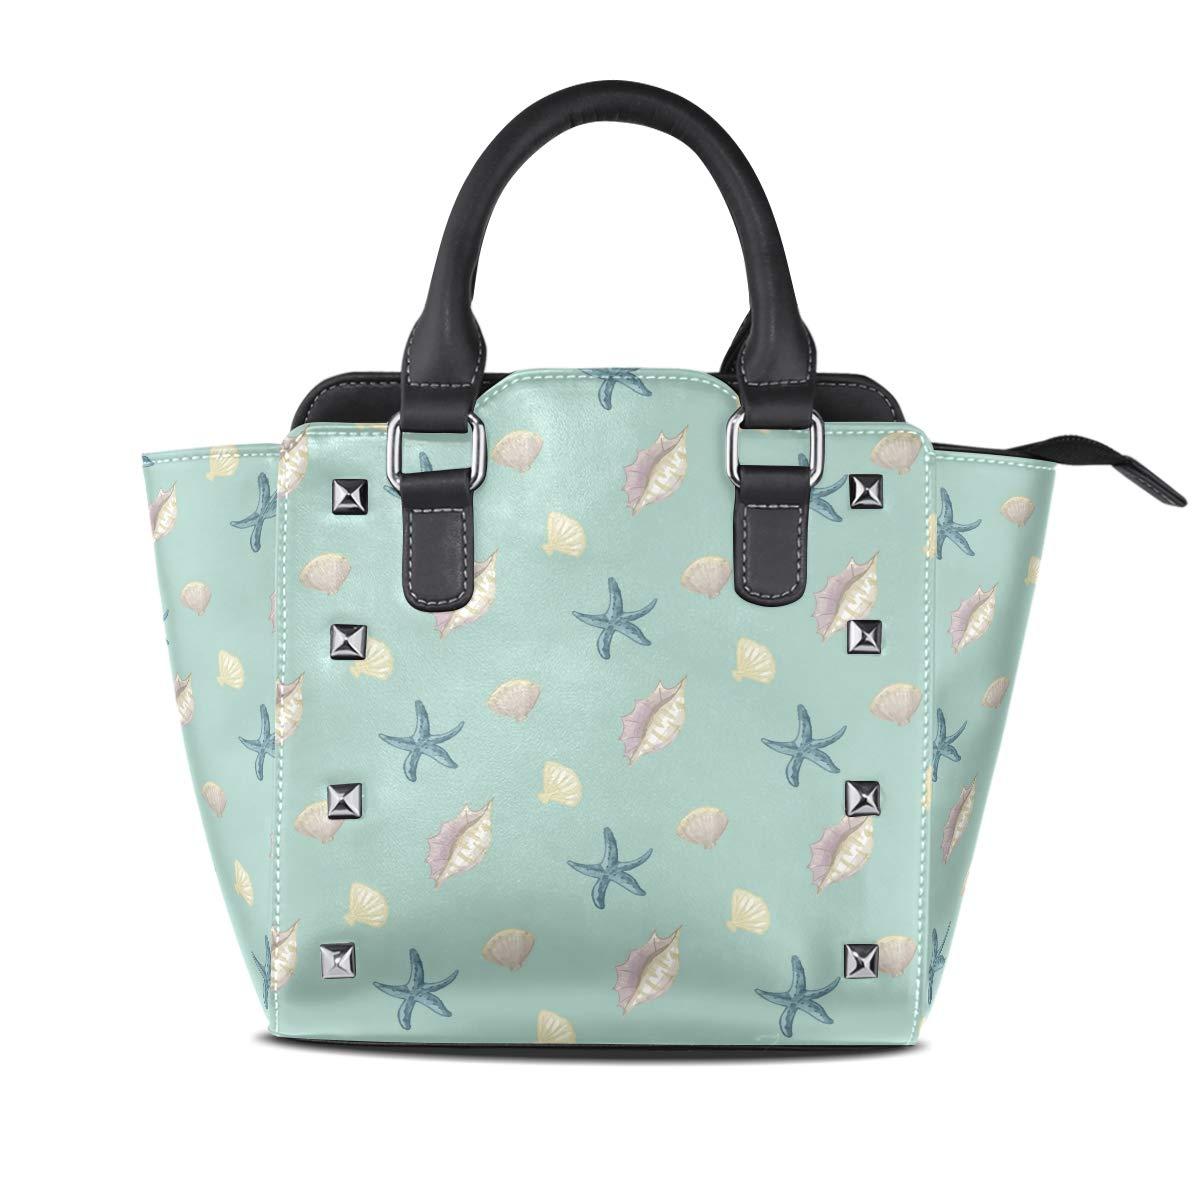 Design 1 Starfish Funny Shell Top Handle Satchel Handbags Leather Tote Adjustable Shoulder Rivet Bag for Women